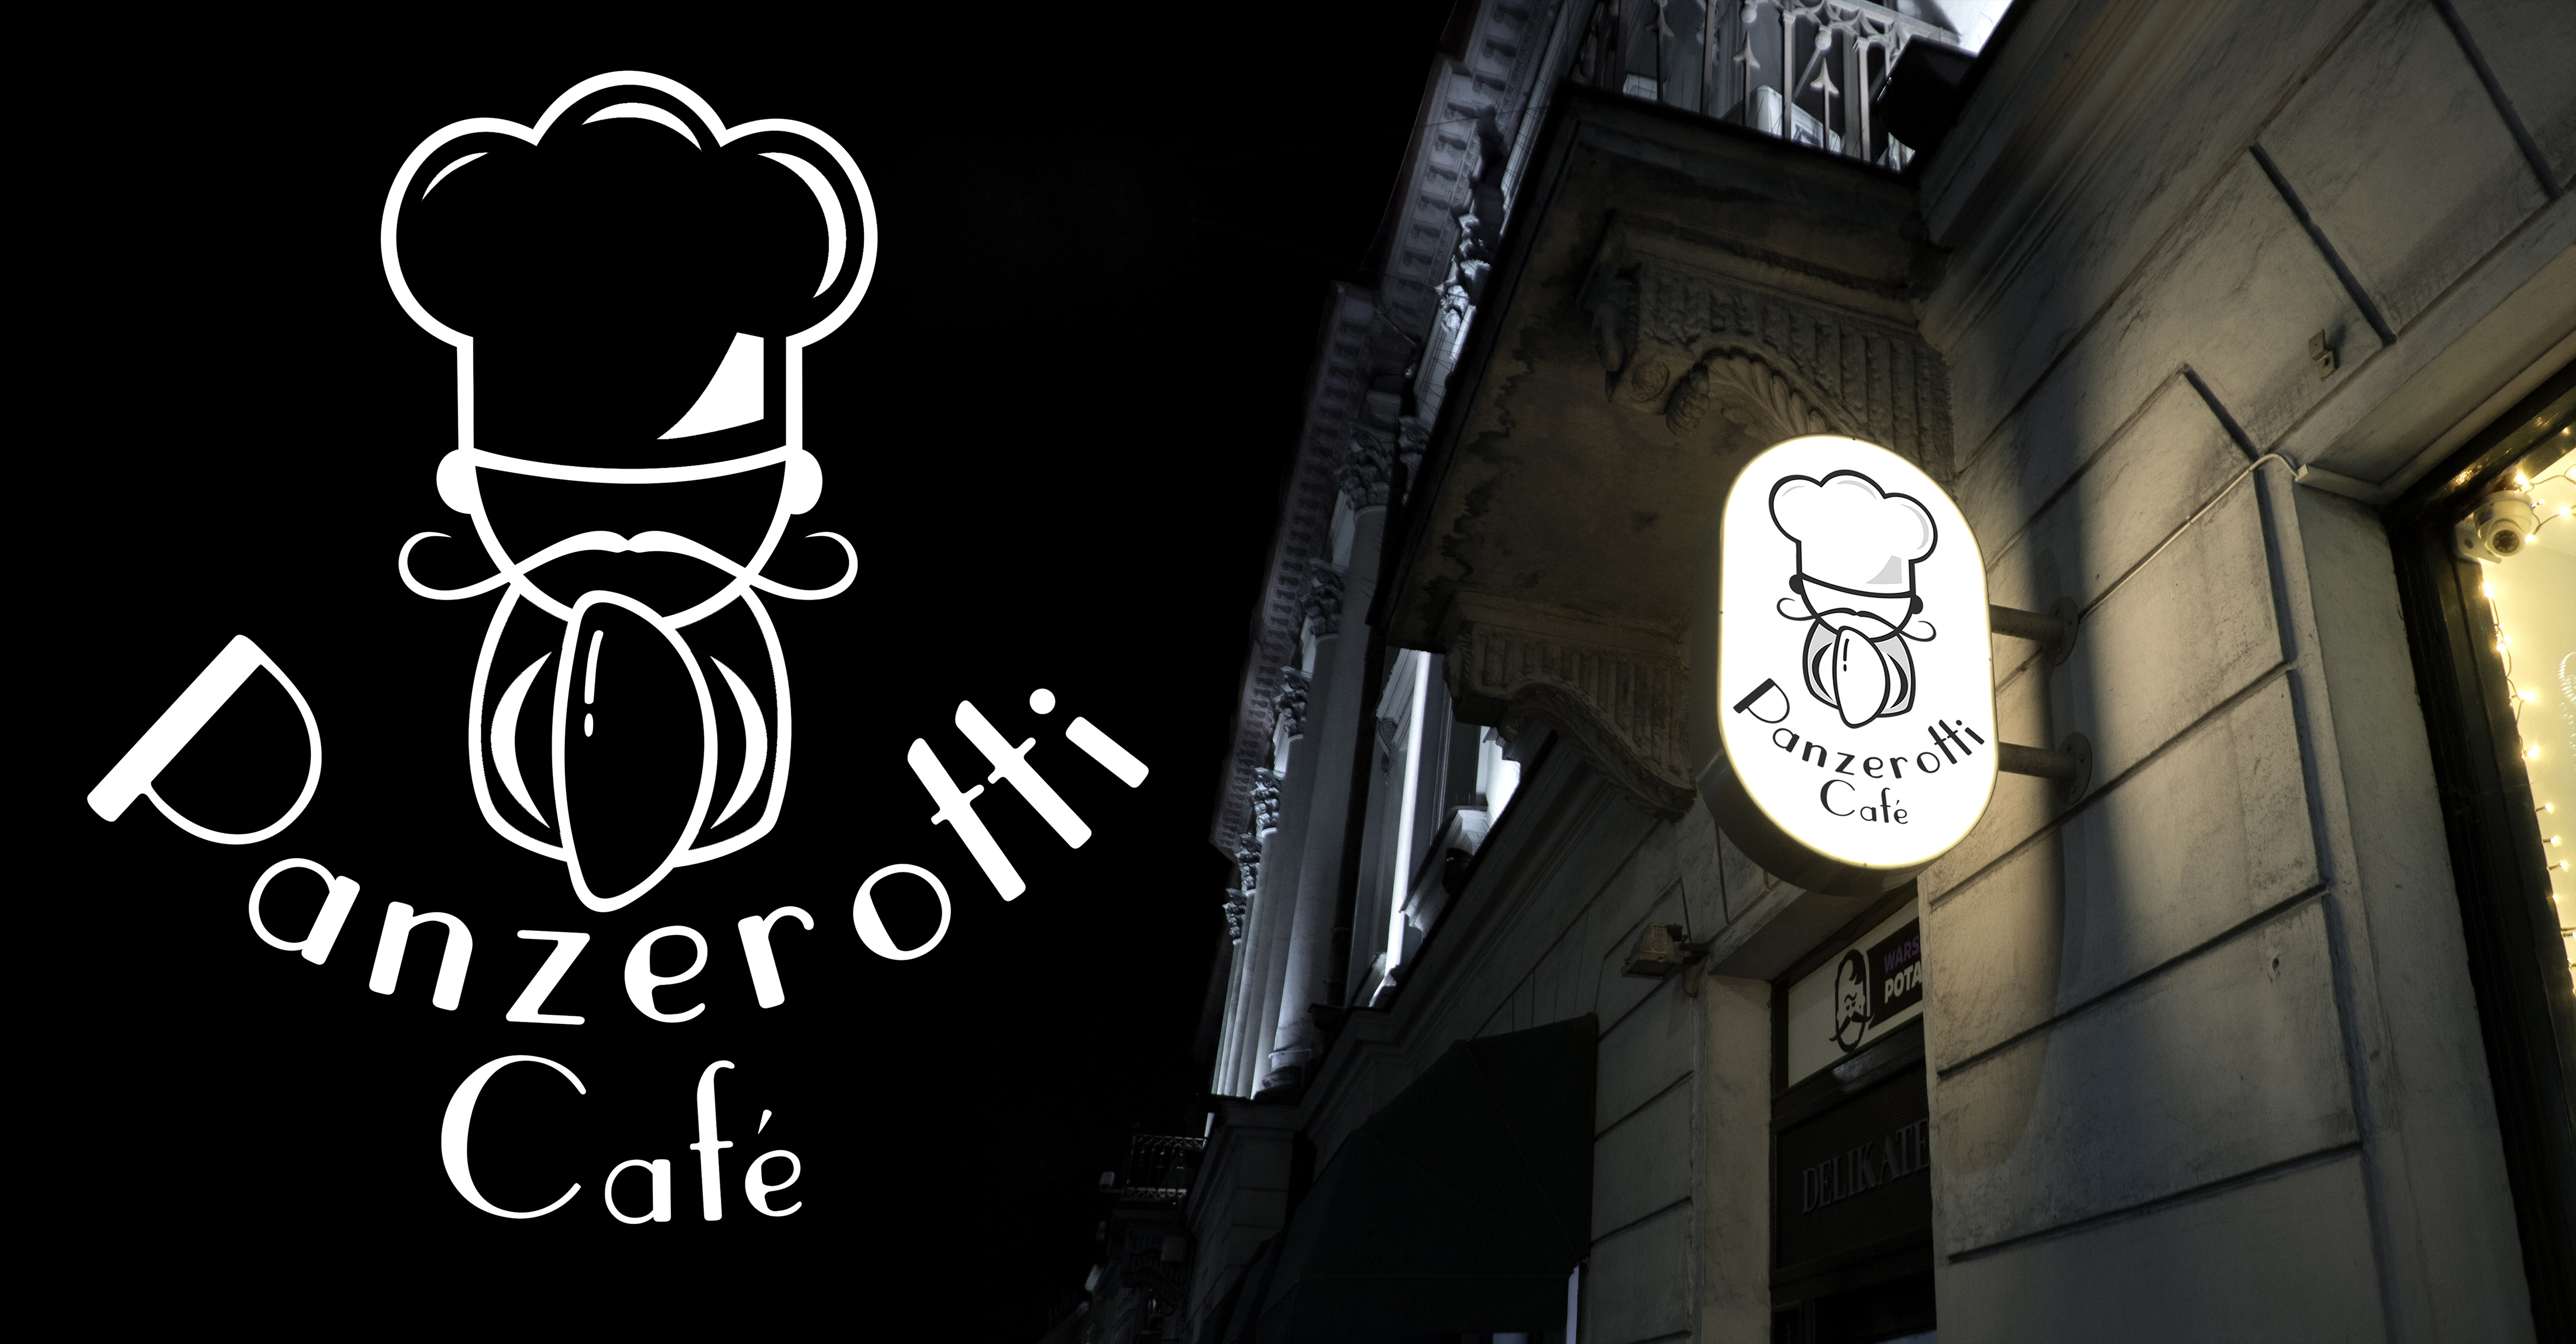 Фото Разработка логотипа для Panzerotti Cafe